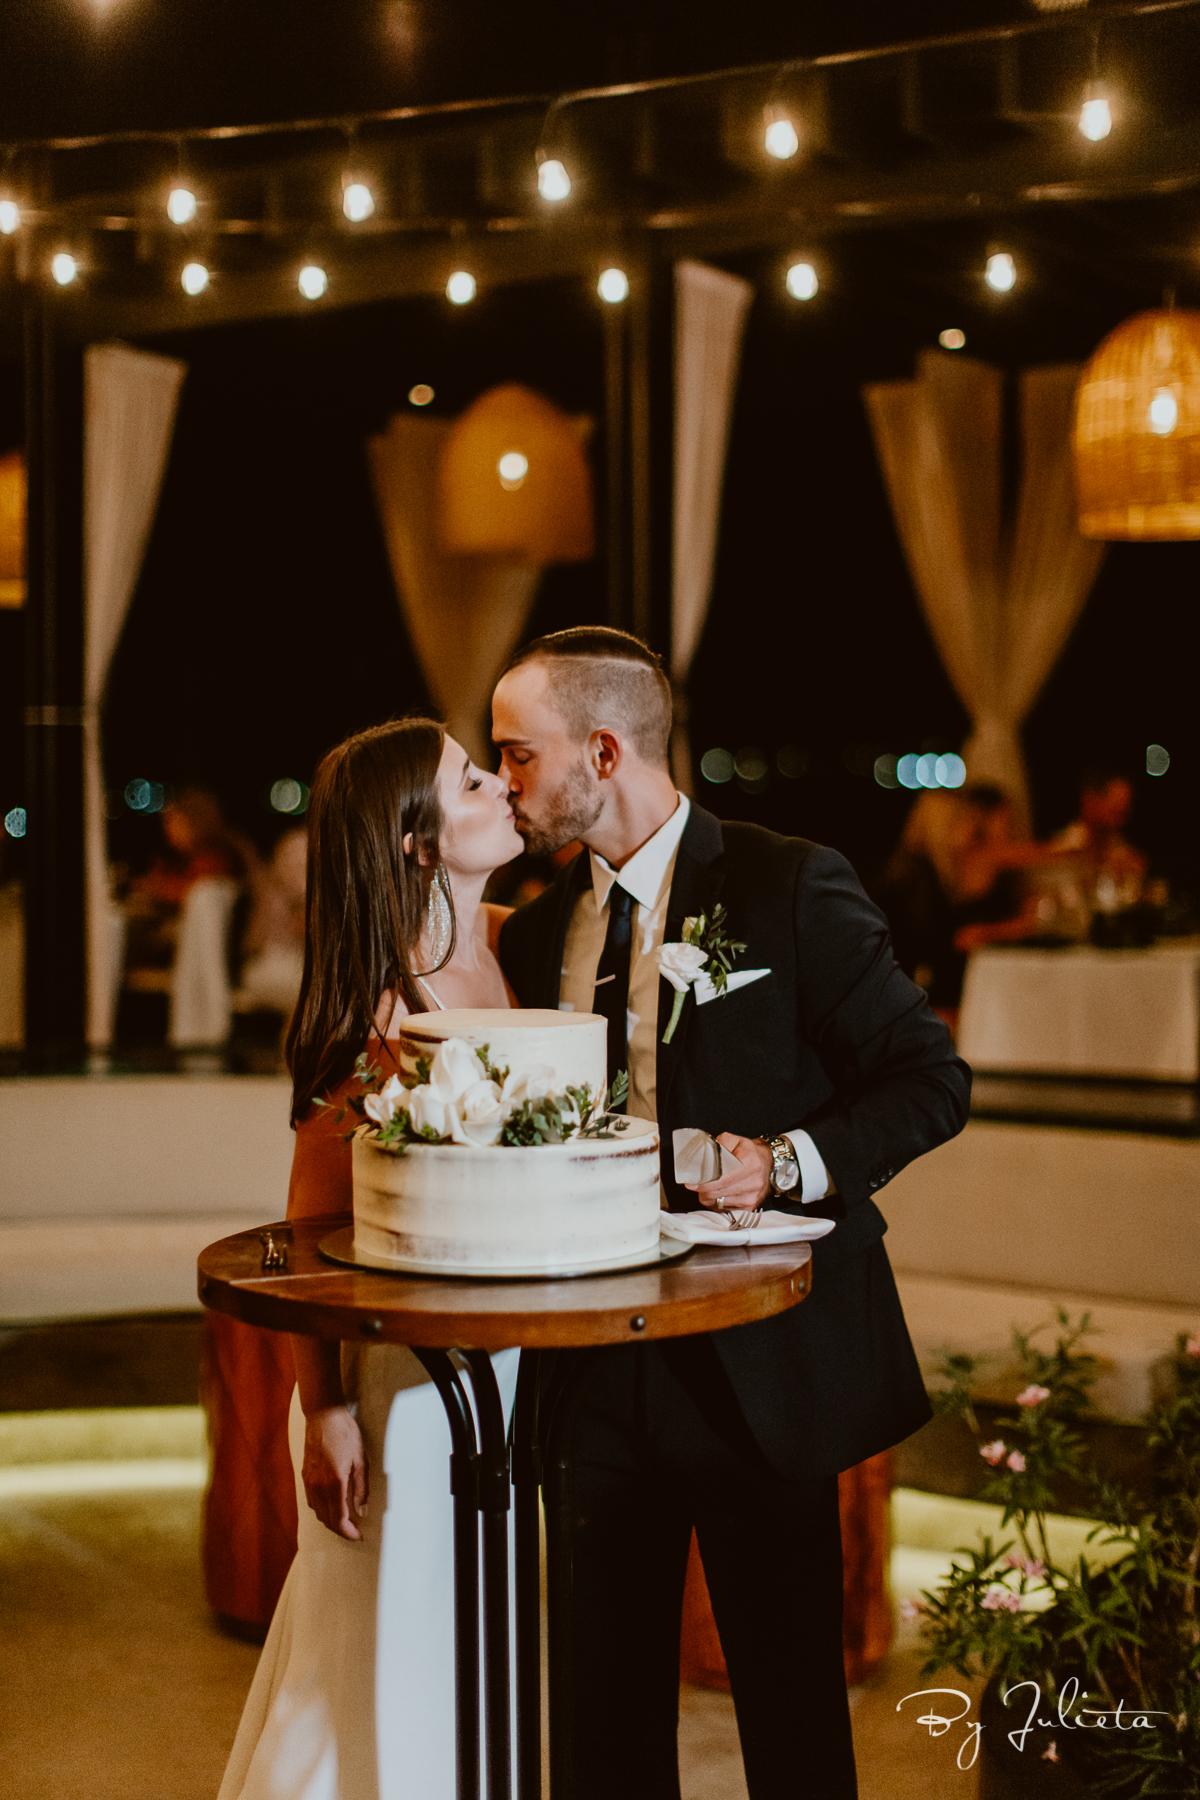 WeddingTheCapeCabo.B+G.JulietaAmezcuaPhotography.(527of533).jpg